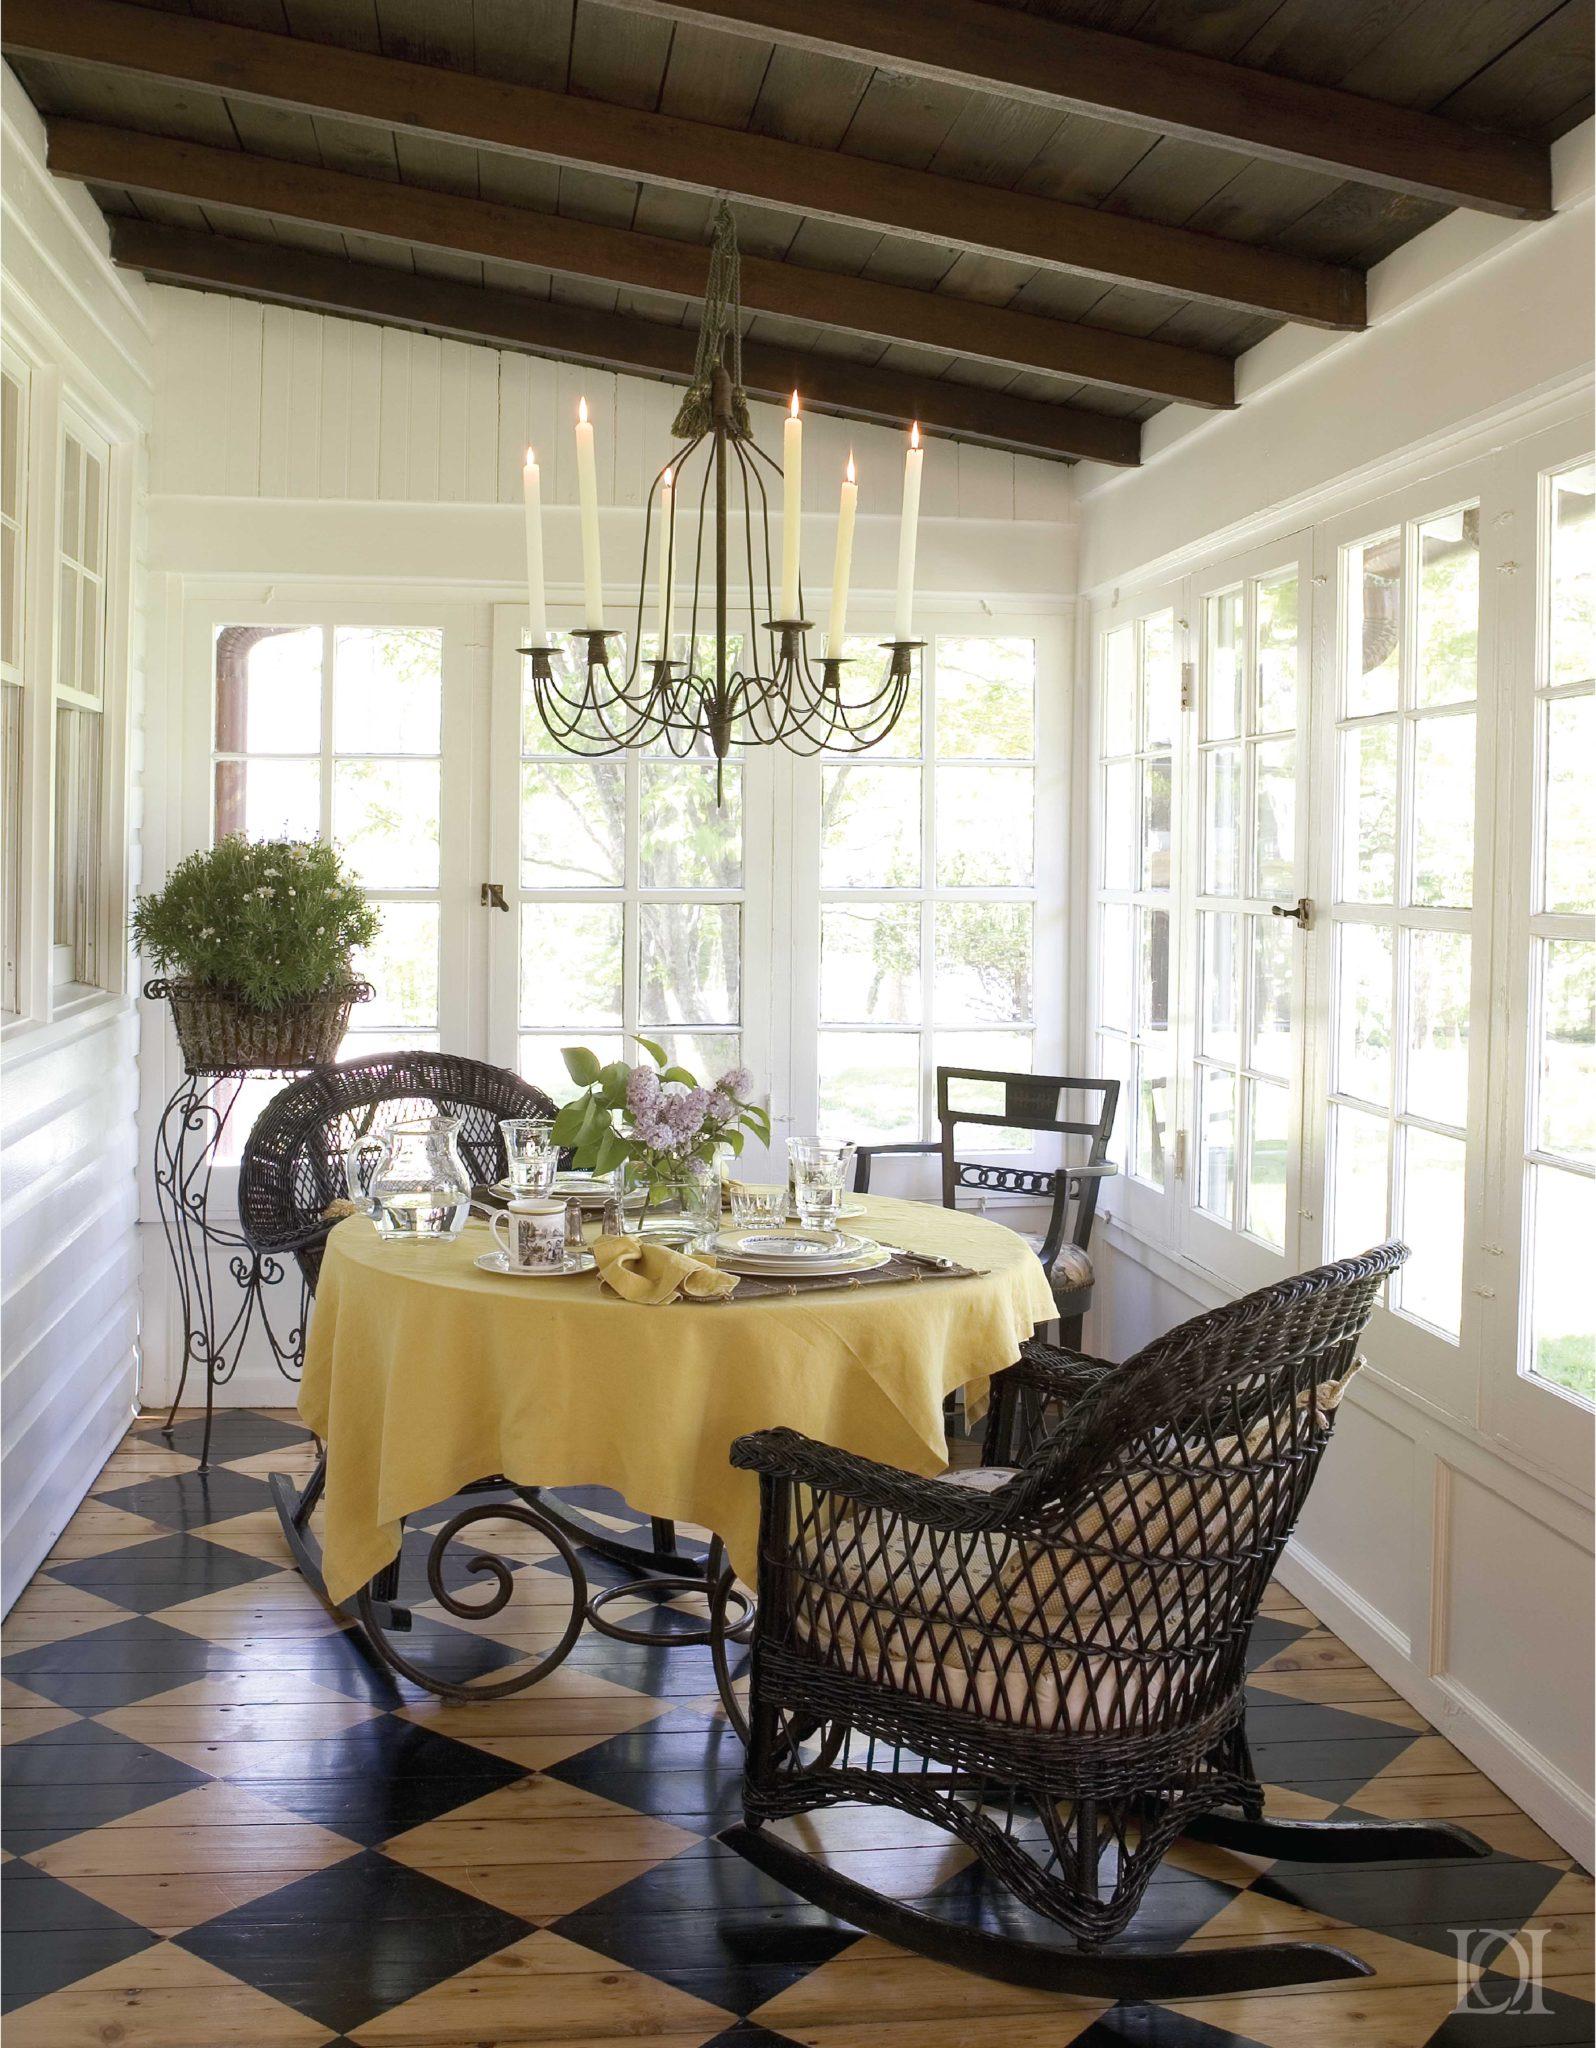 Interior design byDeborah Leamann